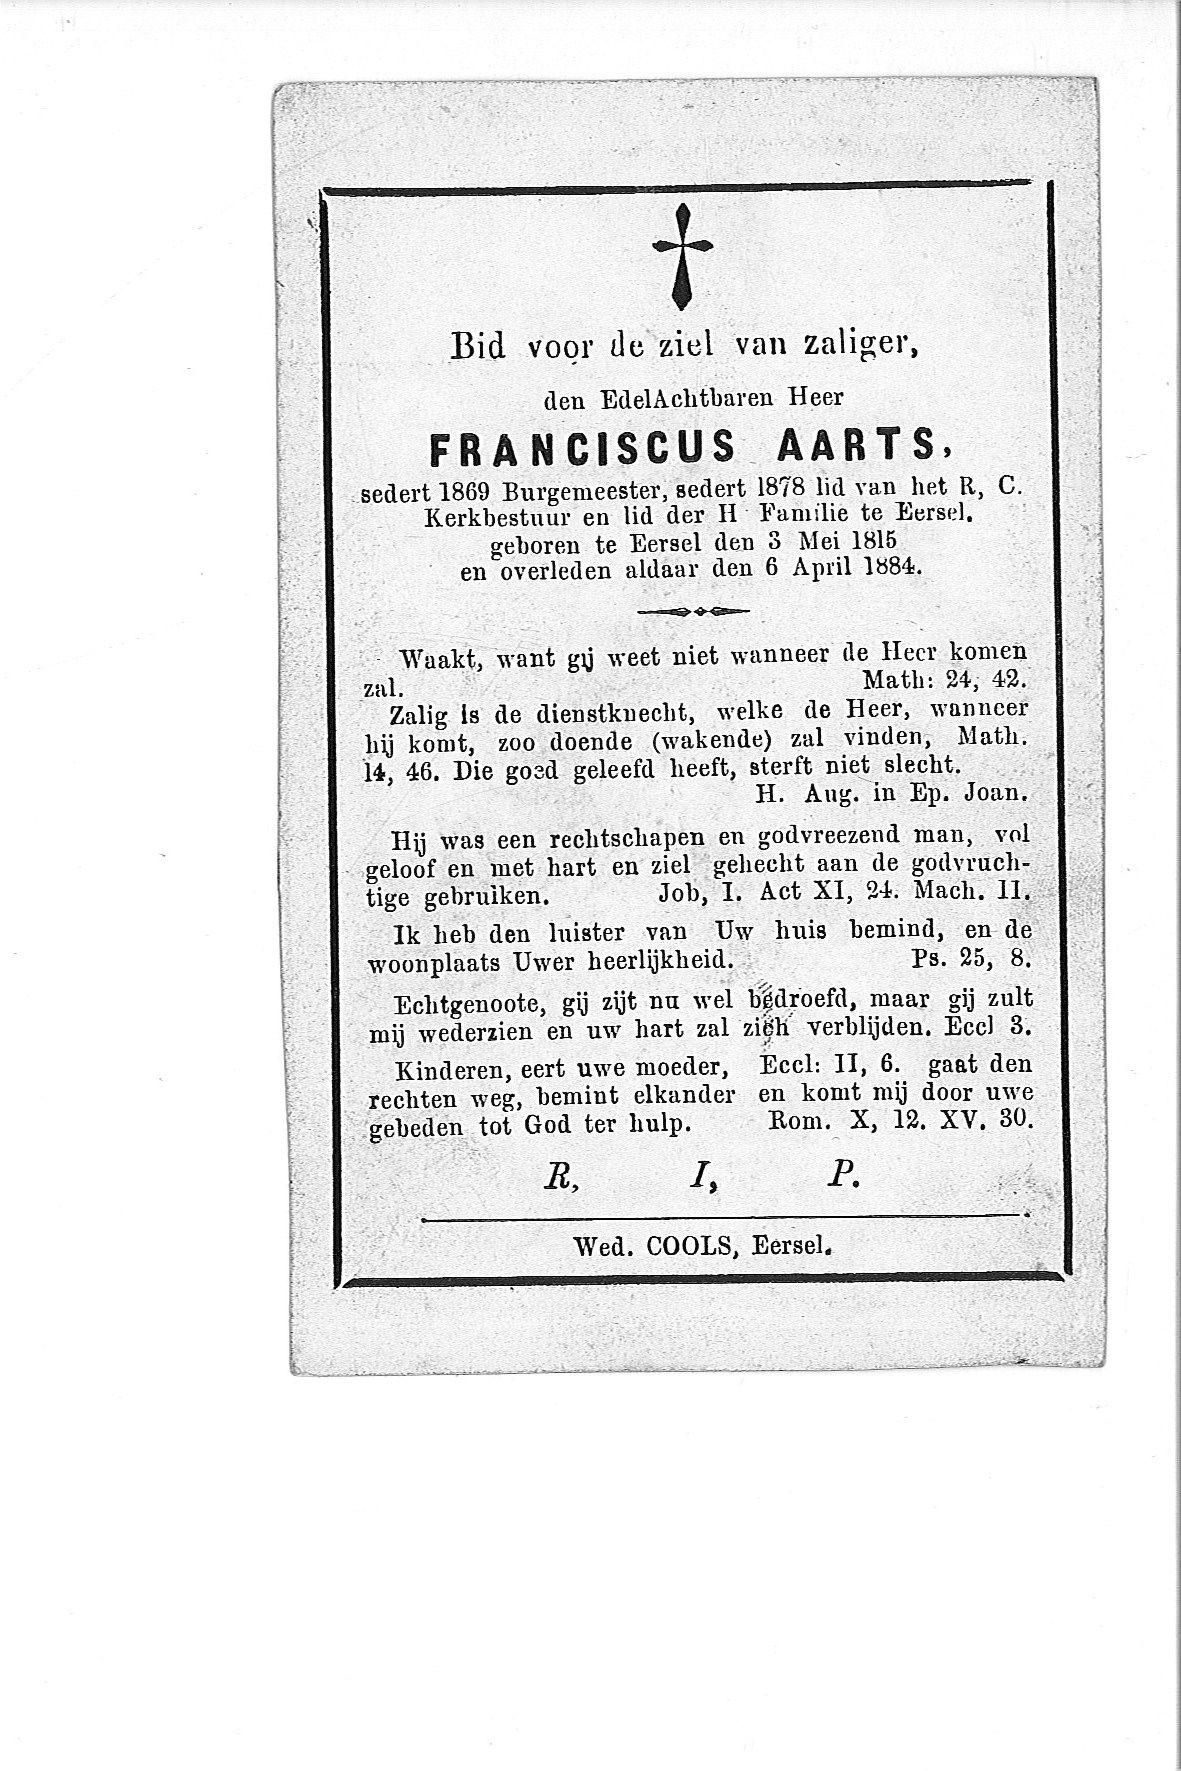 franciscus(1884)20090105132822_00004.jpg